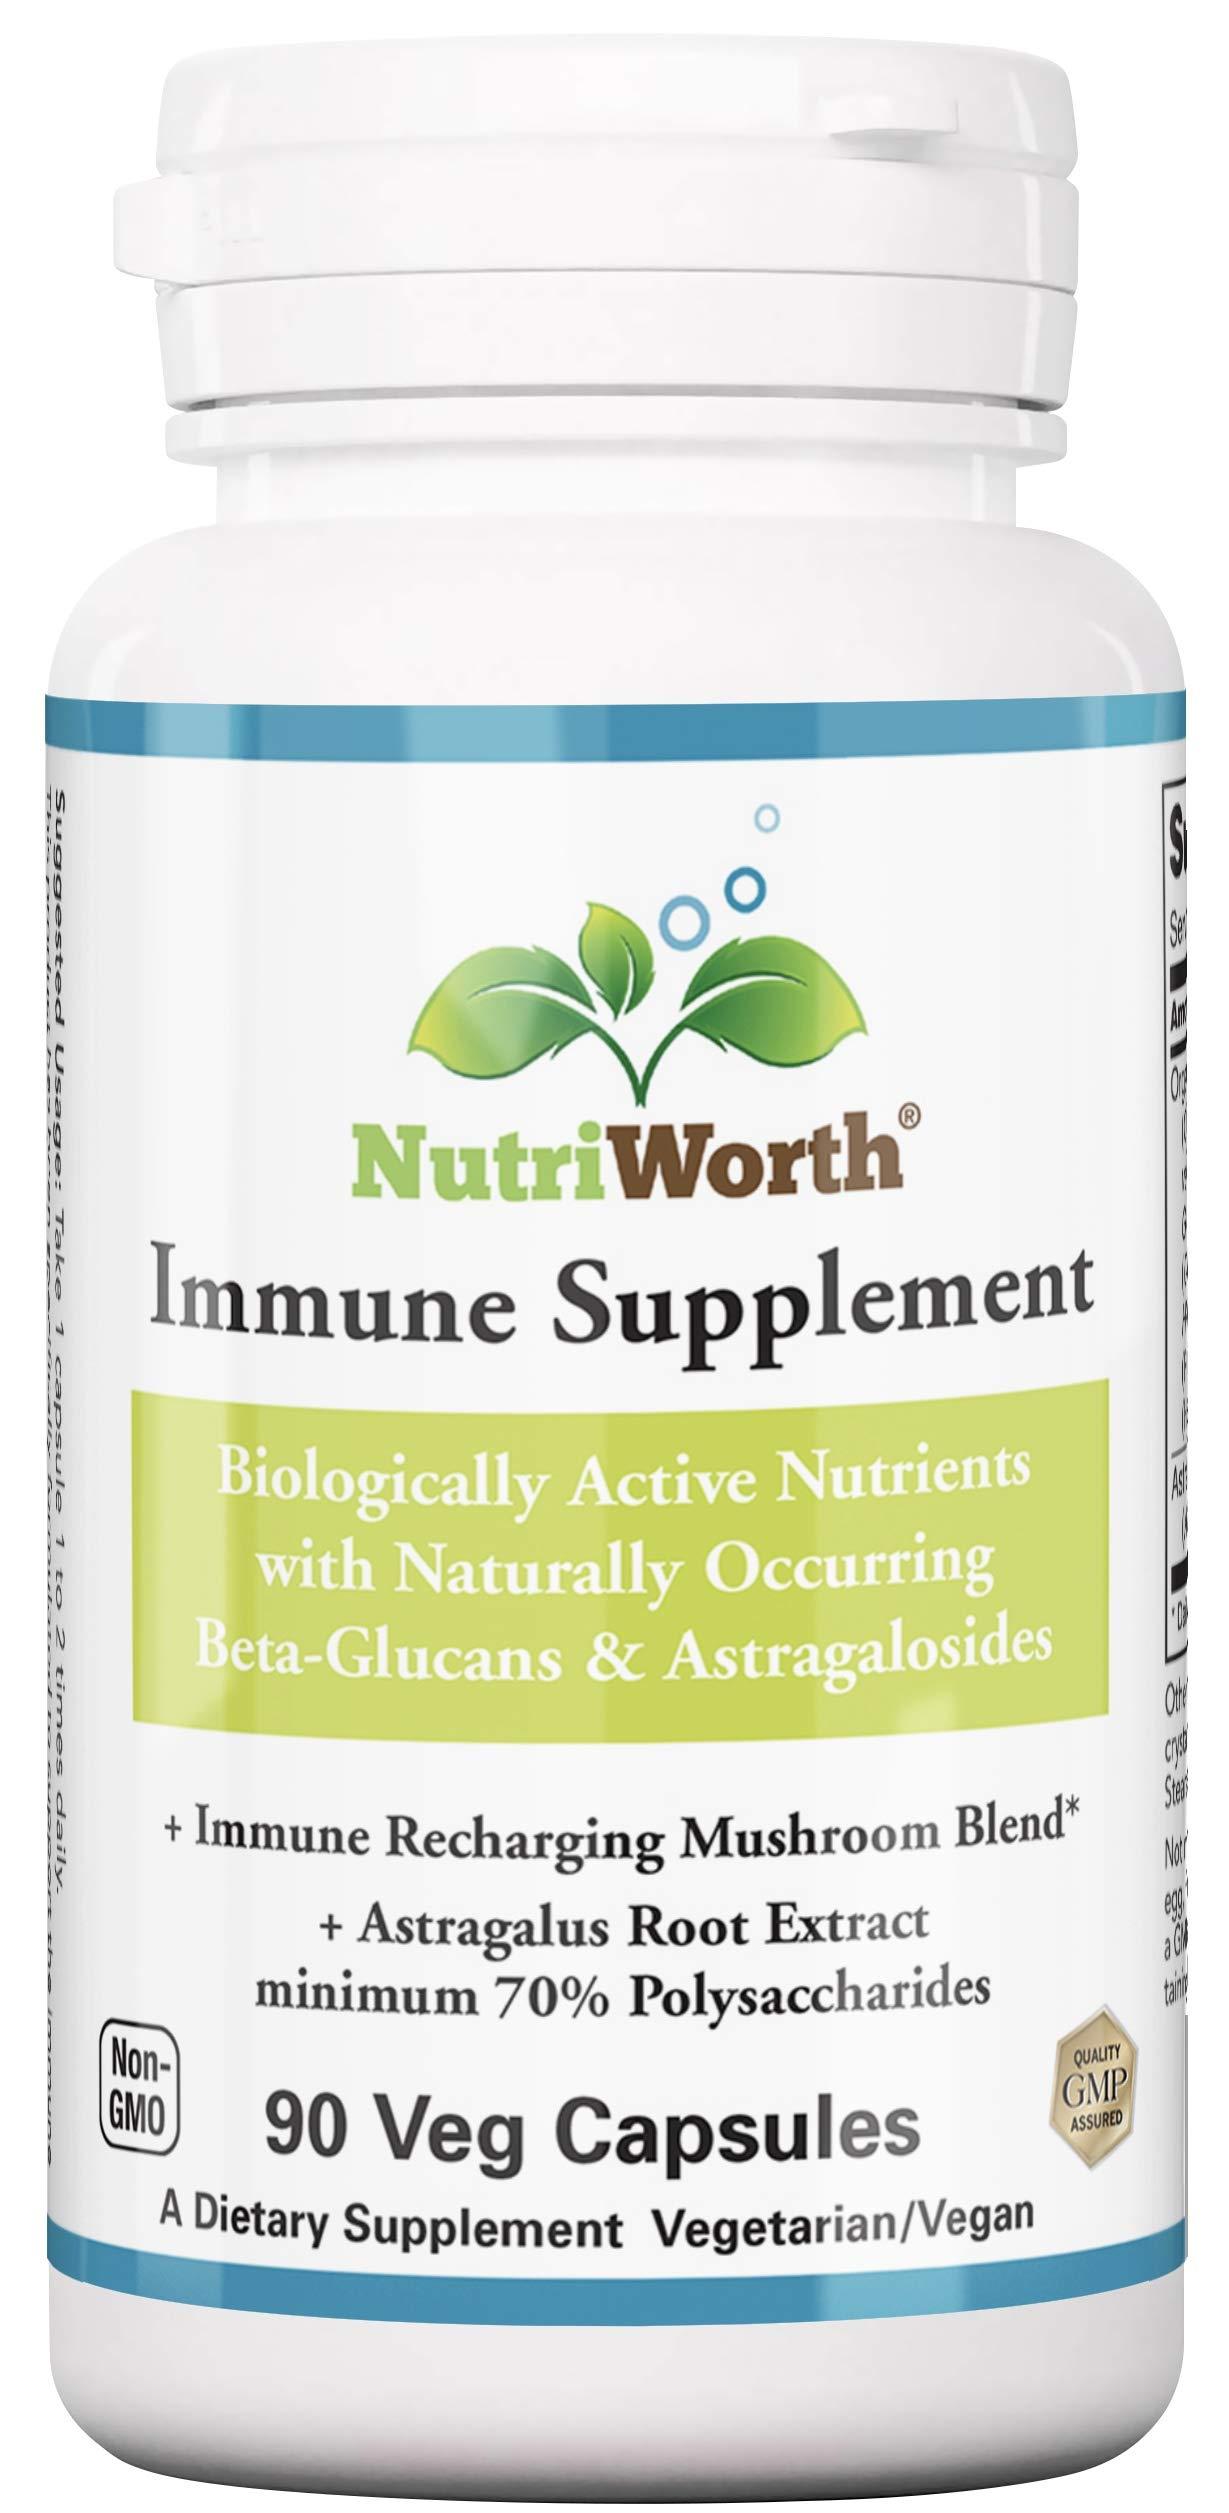 Immune Support Supplement by NutriWorth - Immune Recharging Organic Mushroom Blend - Lions Mane, Shiitake, Cordyceps, Reishi, Turkey Tail, Maitake, Phellinus Linteus with Astragalus Root Extract